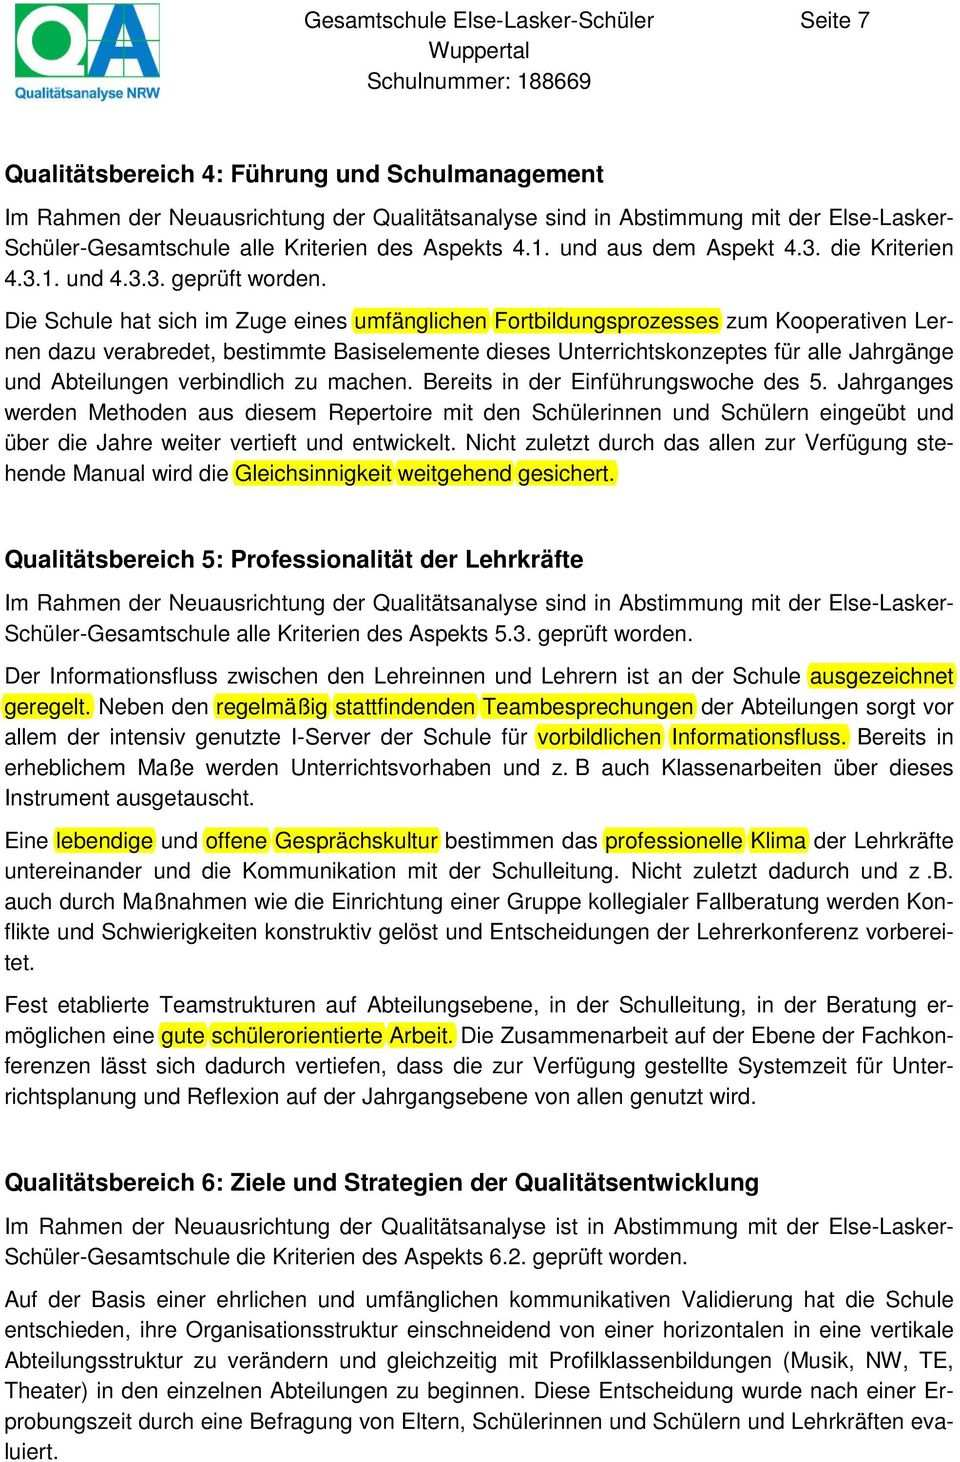 Gesamtschule Else Lasker Schuler Pdf Kostenfreier Download